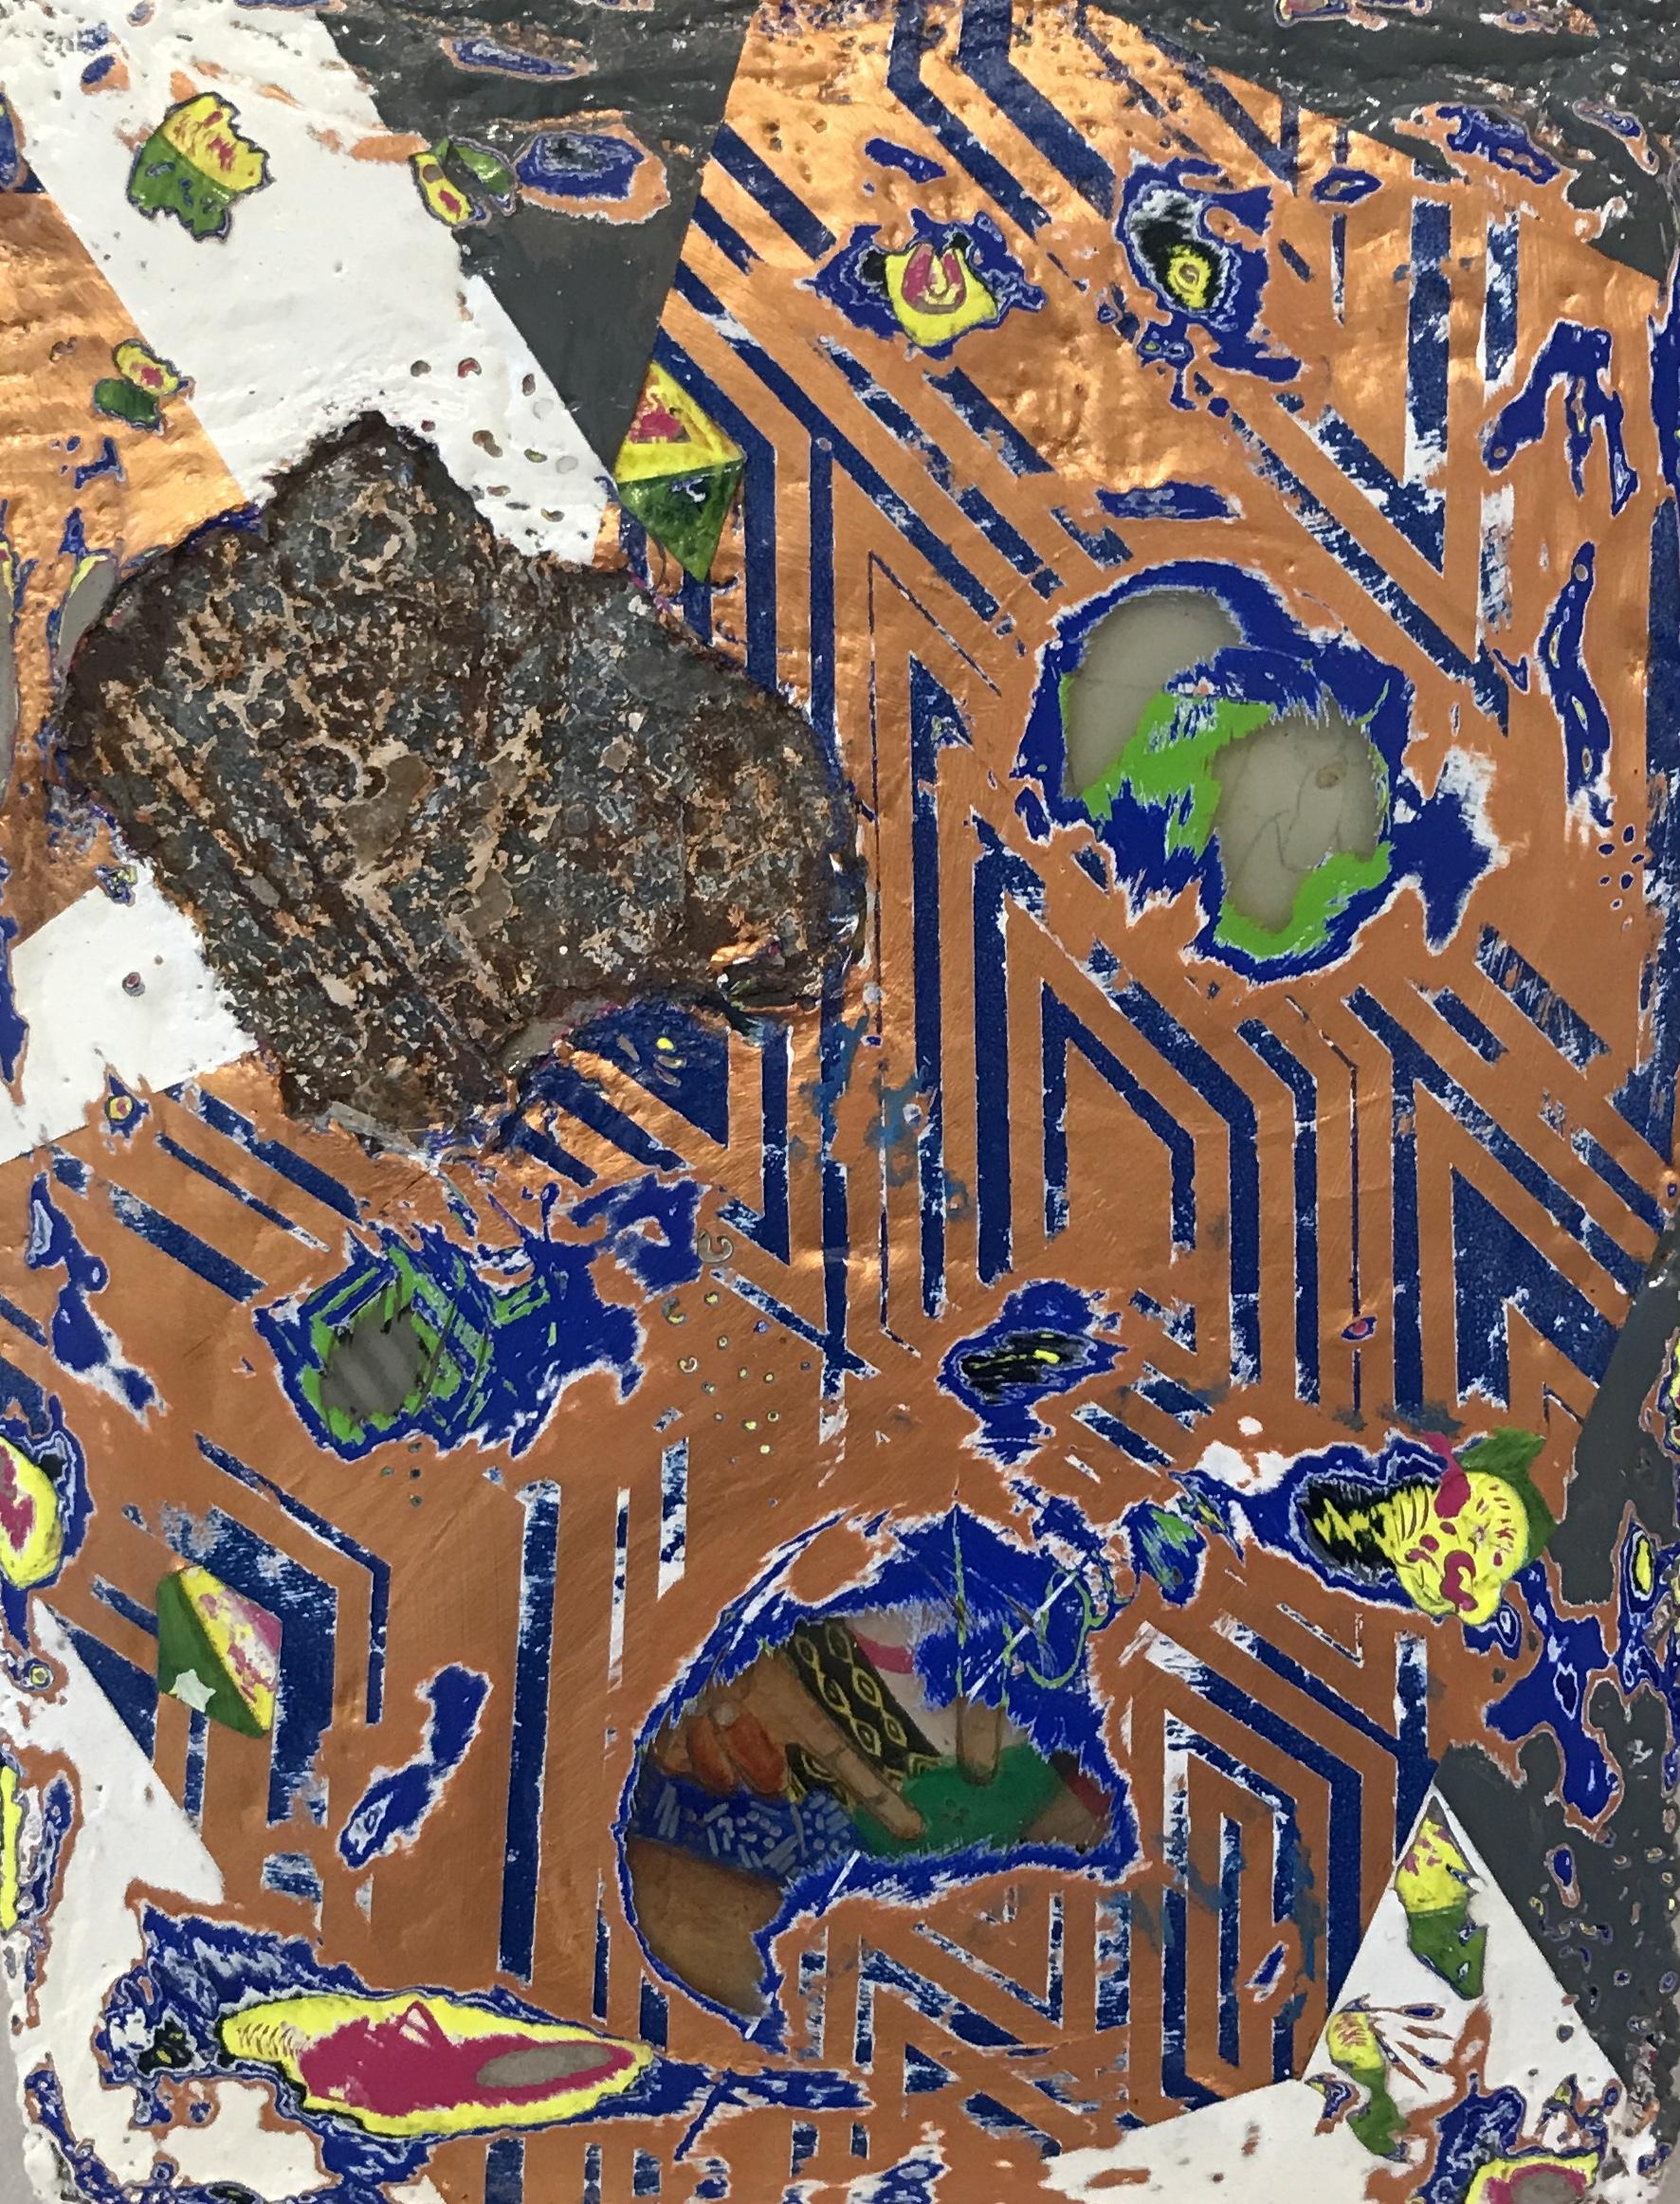 Duhirwe Rushemeza, Untitled, 2018 14 x 17 x 2 in.  Thin-set Mortar, Resin, collage, acrylic and metal detritus on wood